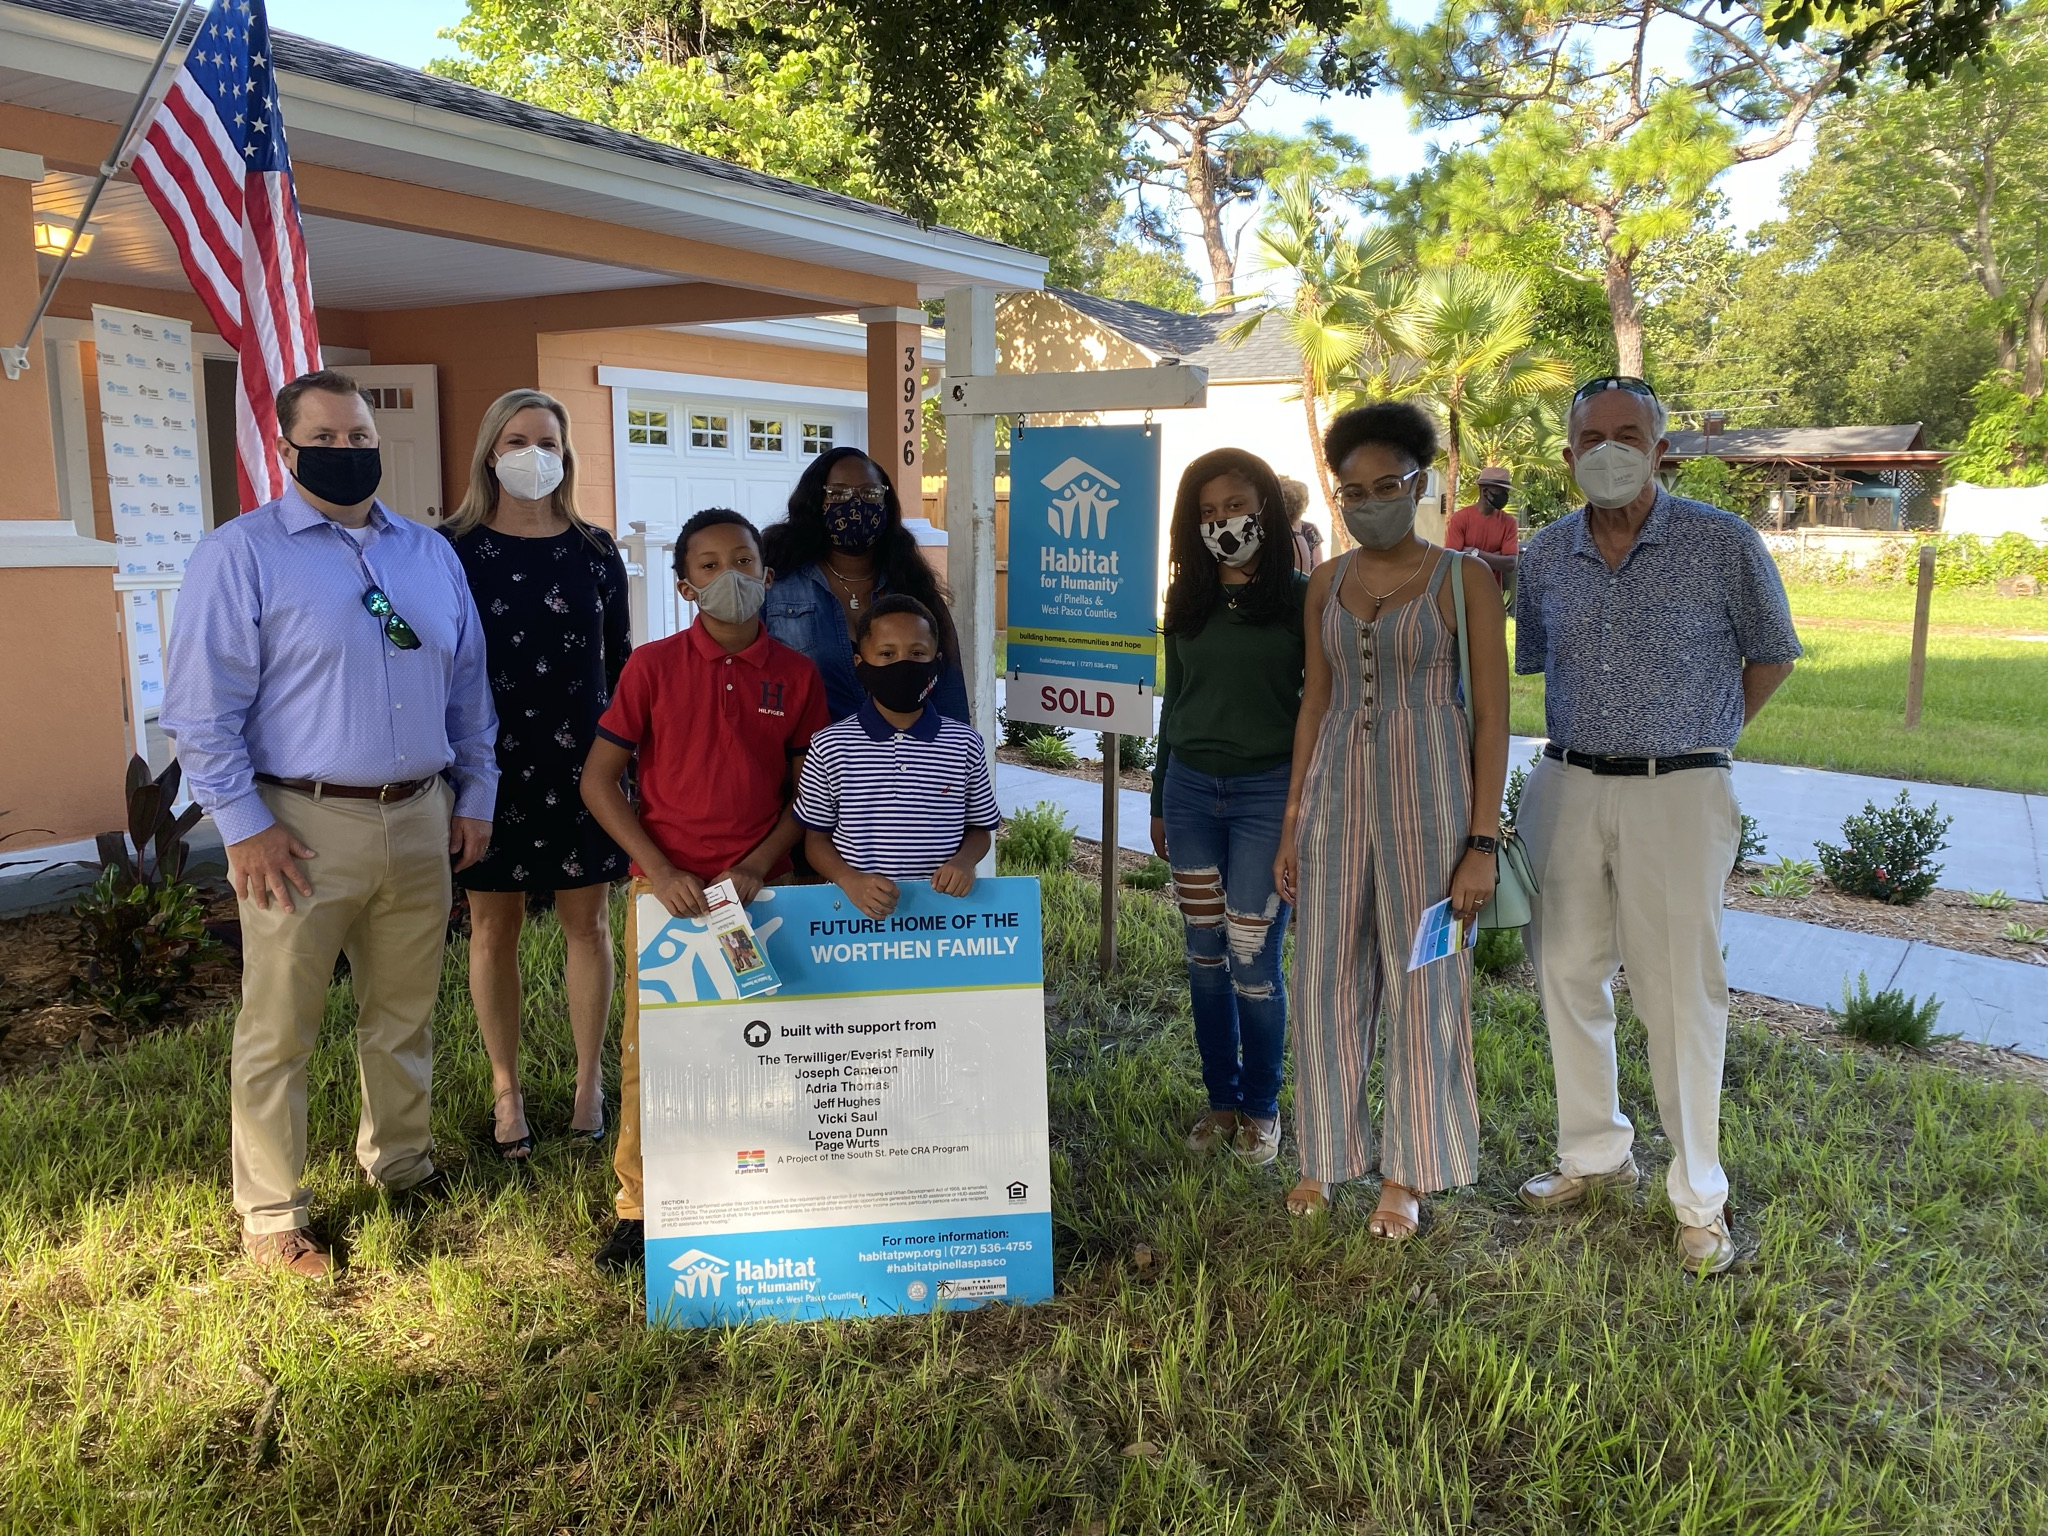 Habitat Home Dedication Celebrates New Homeowner in South St. Pete